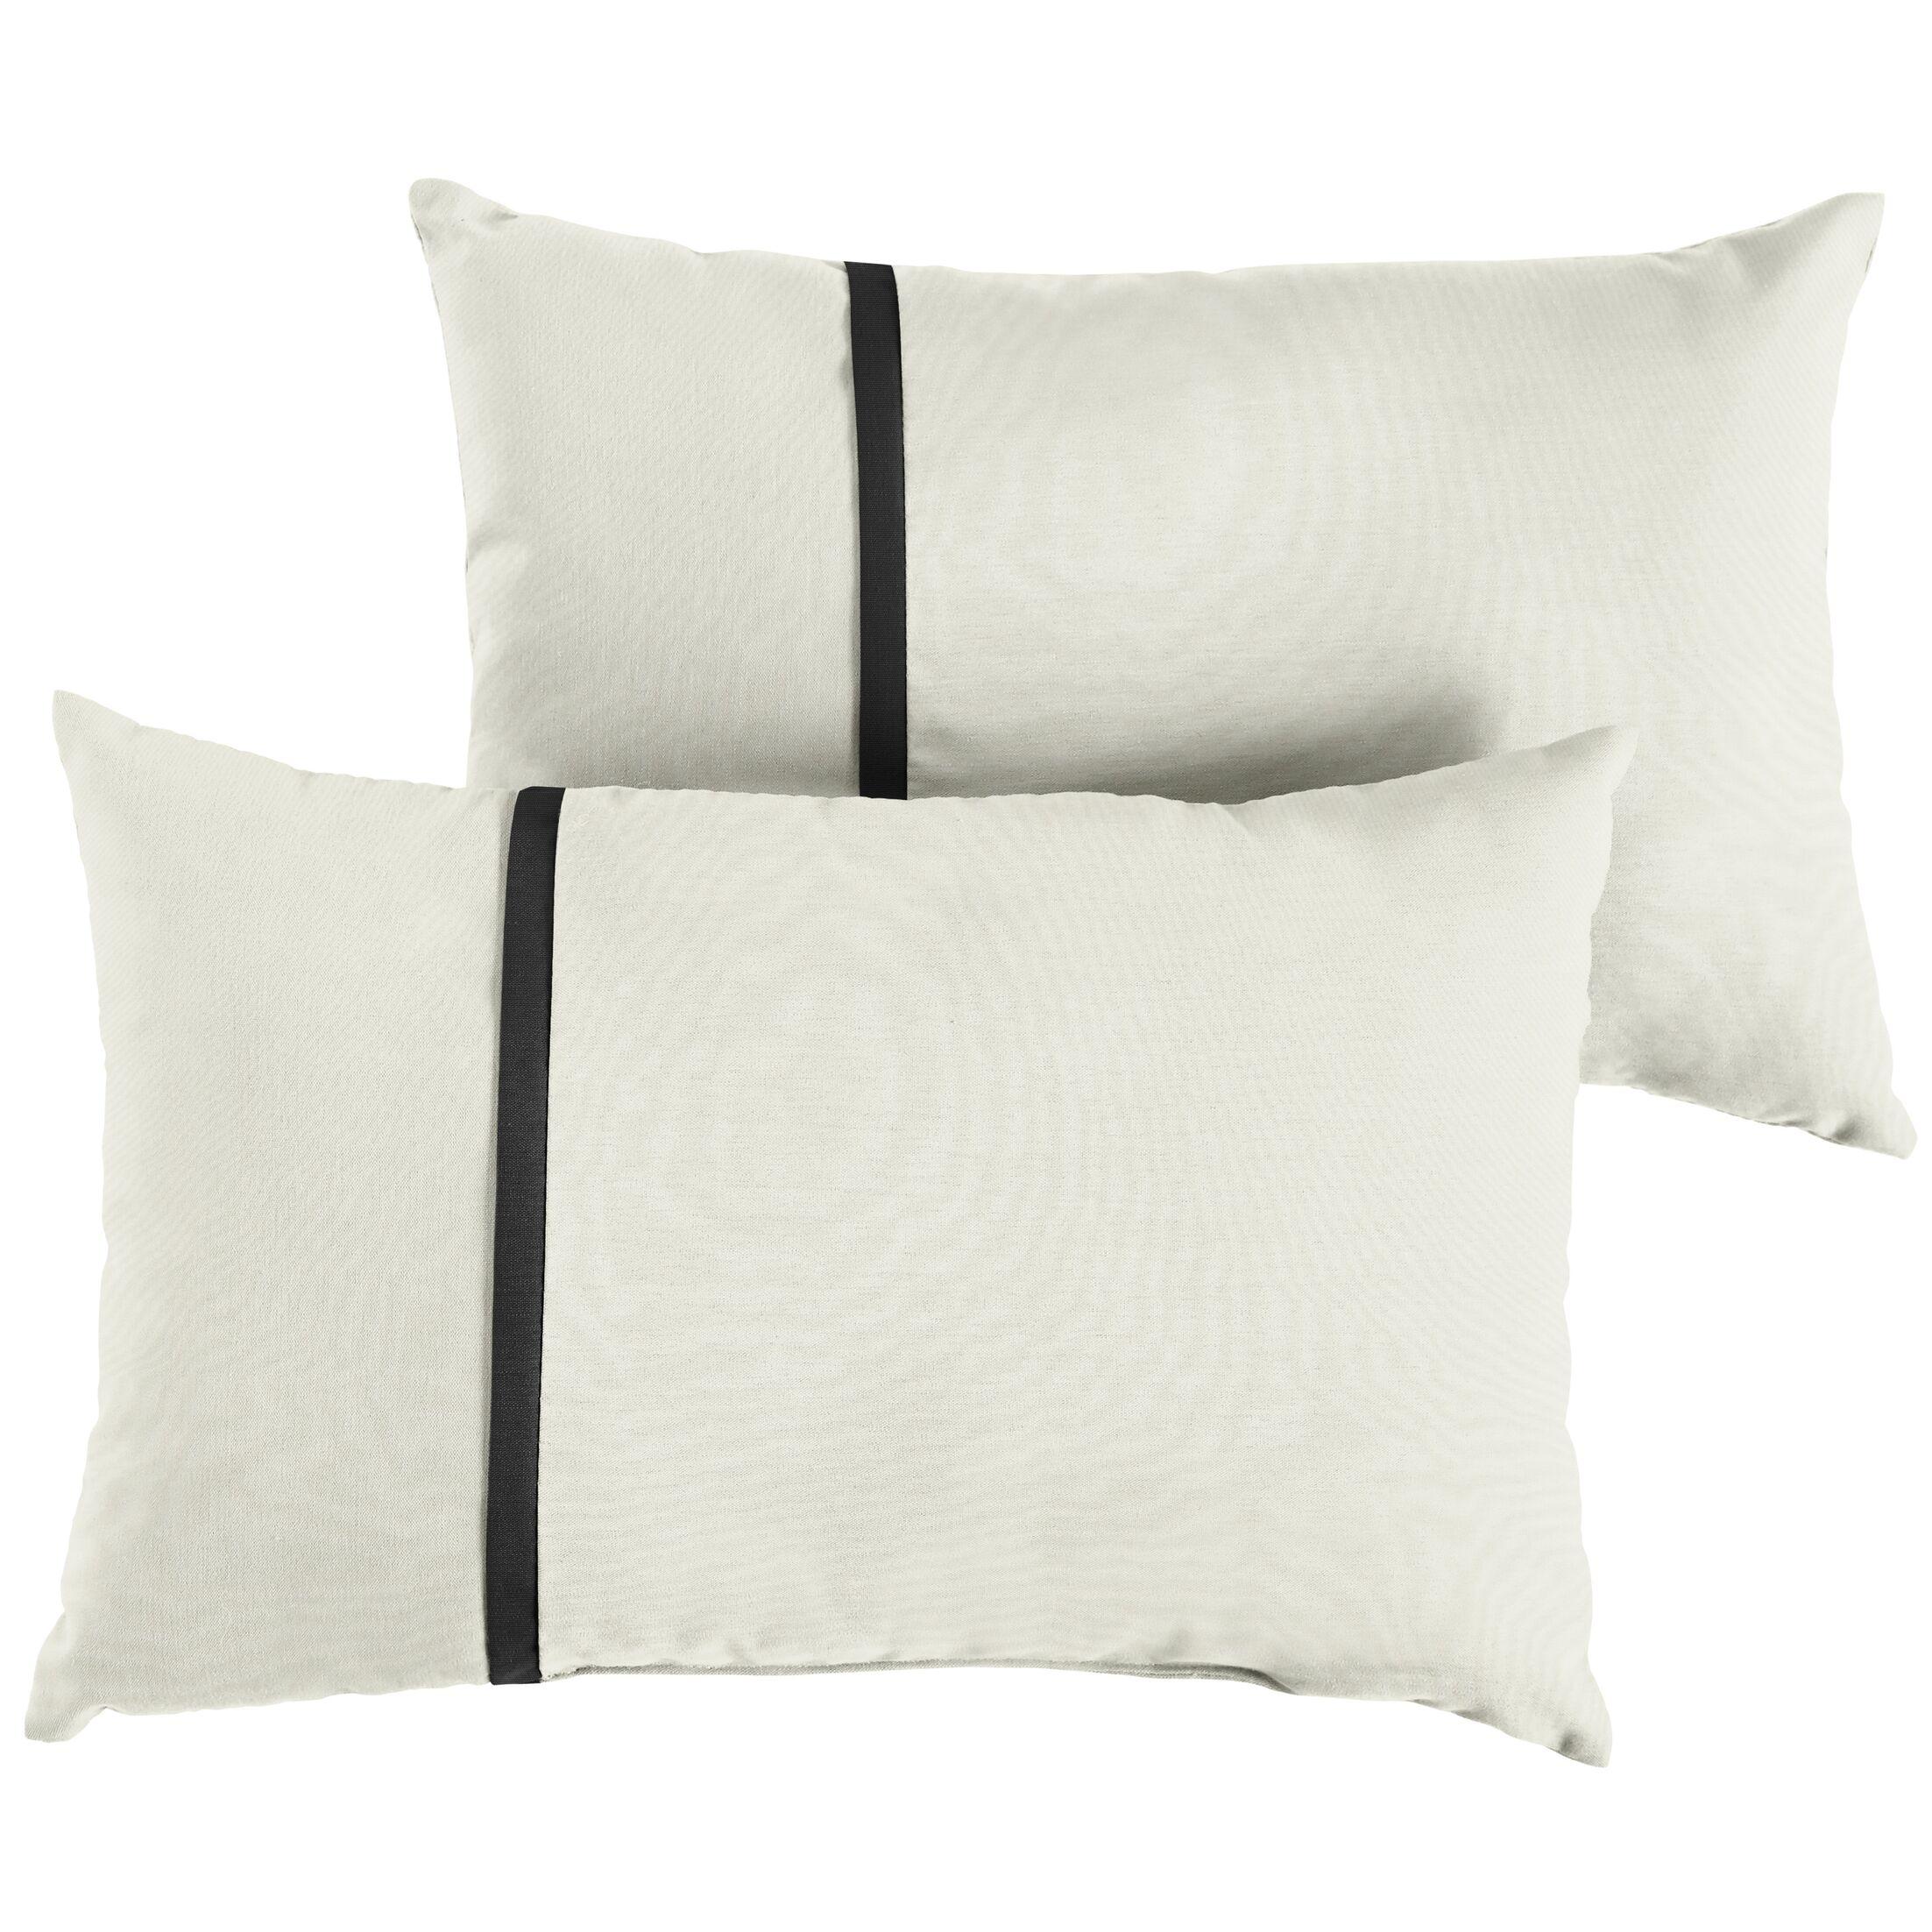 Fort Hamilton Indoor/Outdoor Sunbrella Lumbar Pillow Size: 12